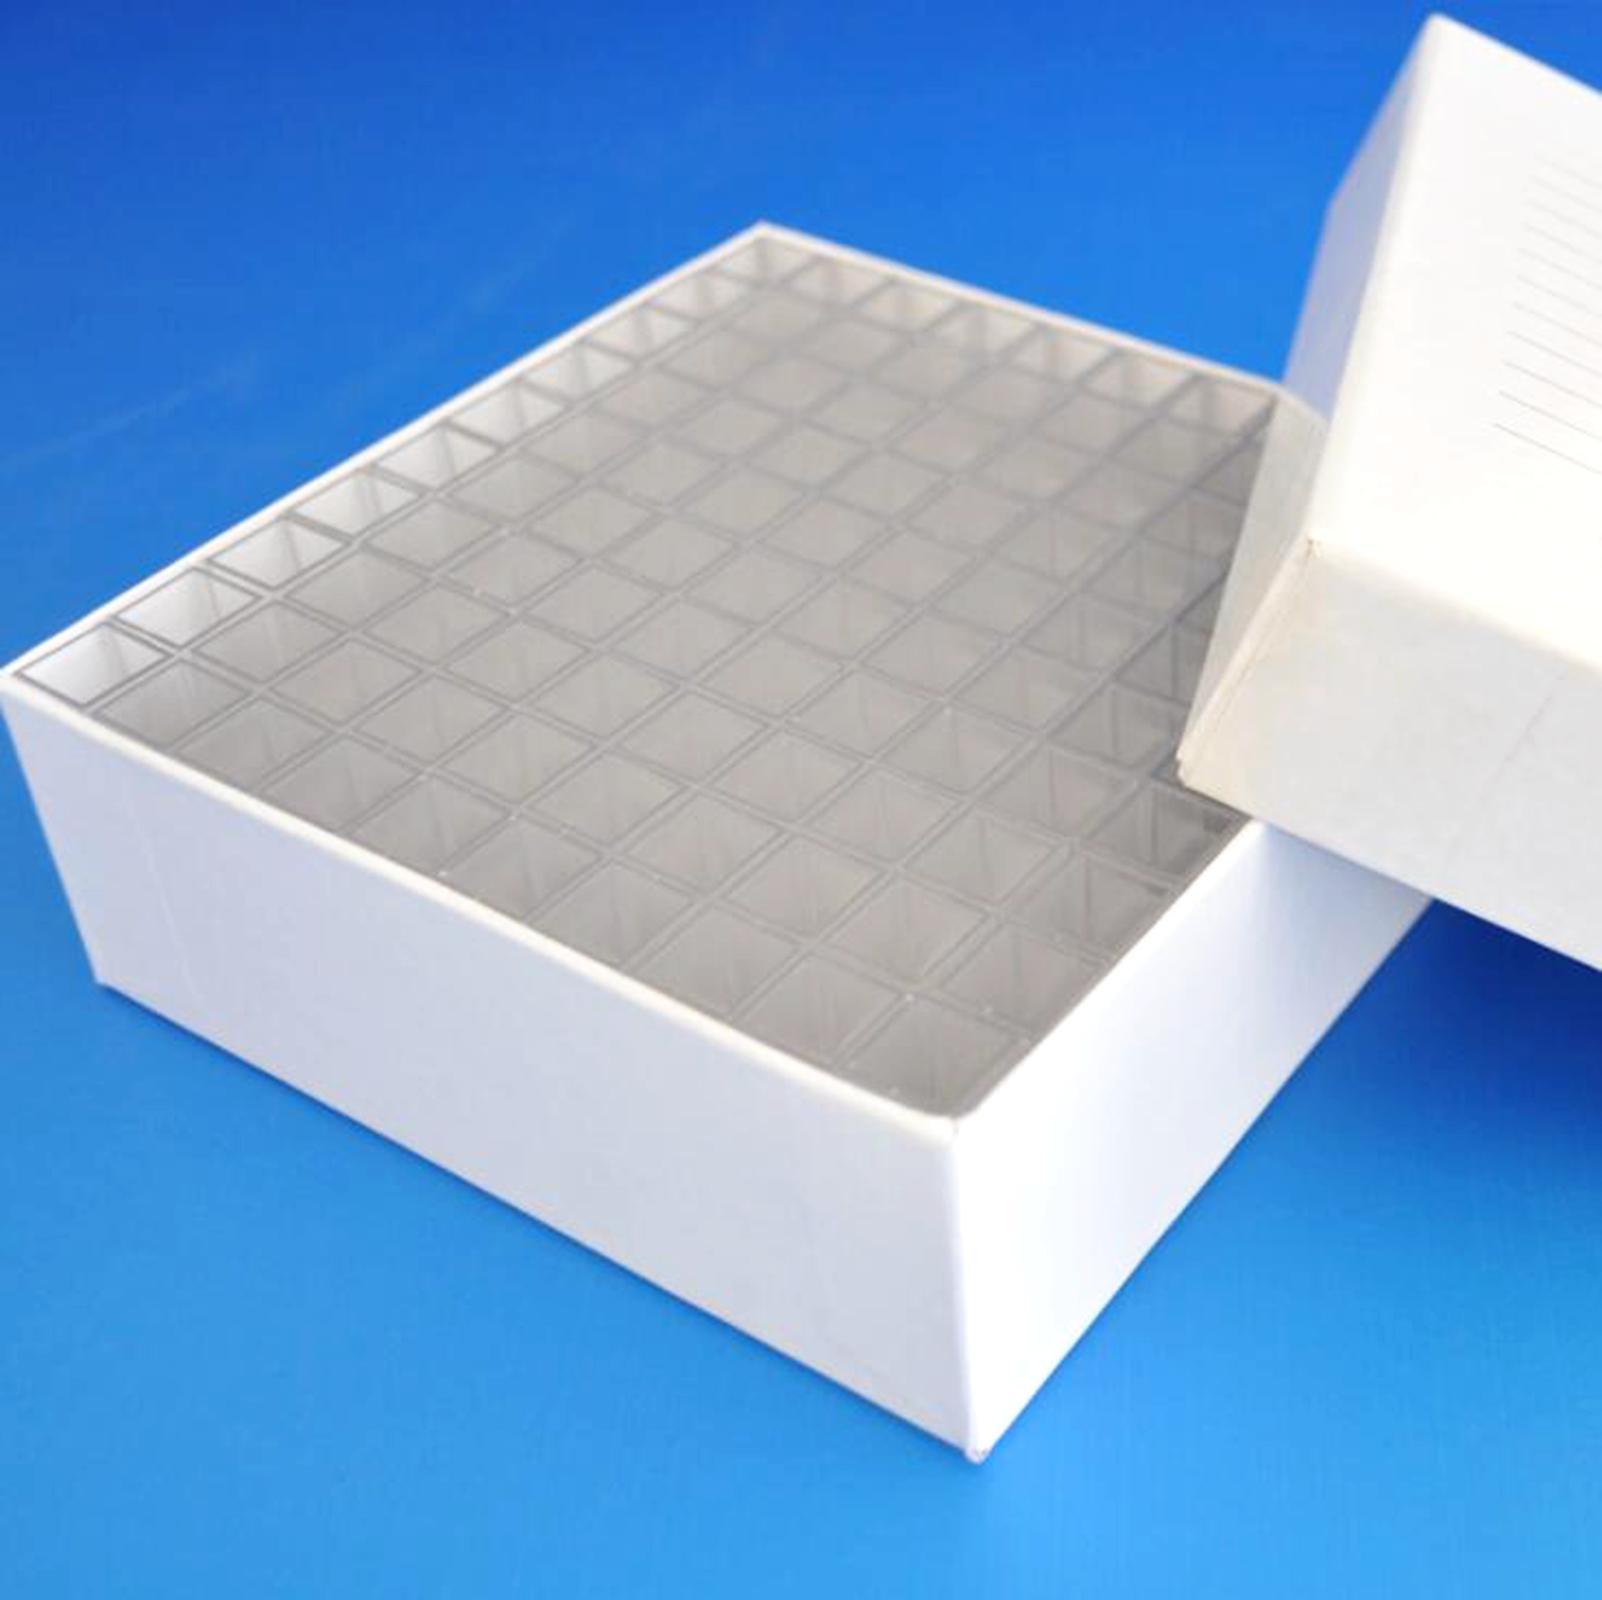 Box Of 100pcs 1.5ml Semimicro Square Plastic Test Tubes Vials  Container Craft Cuvette Lab Kit Tools